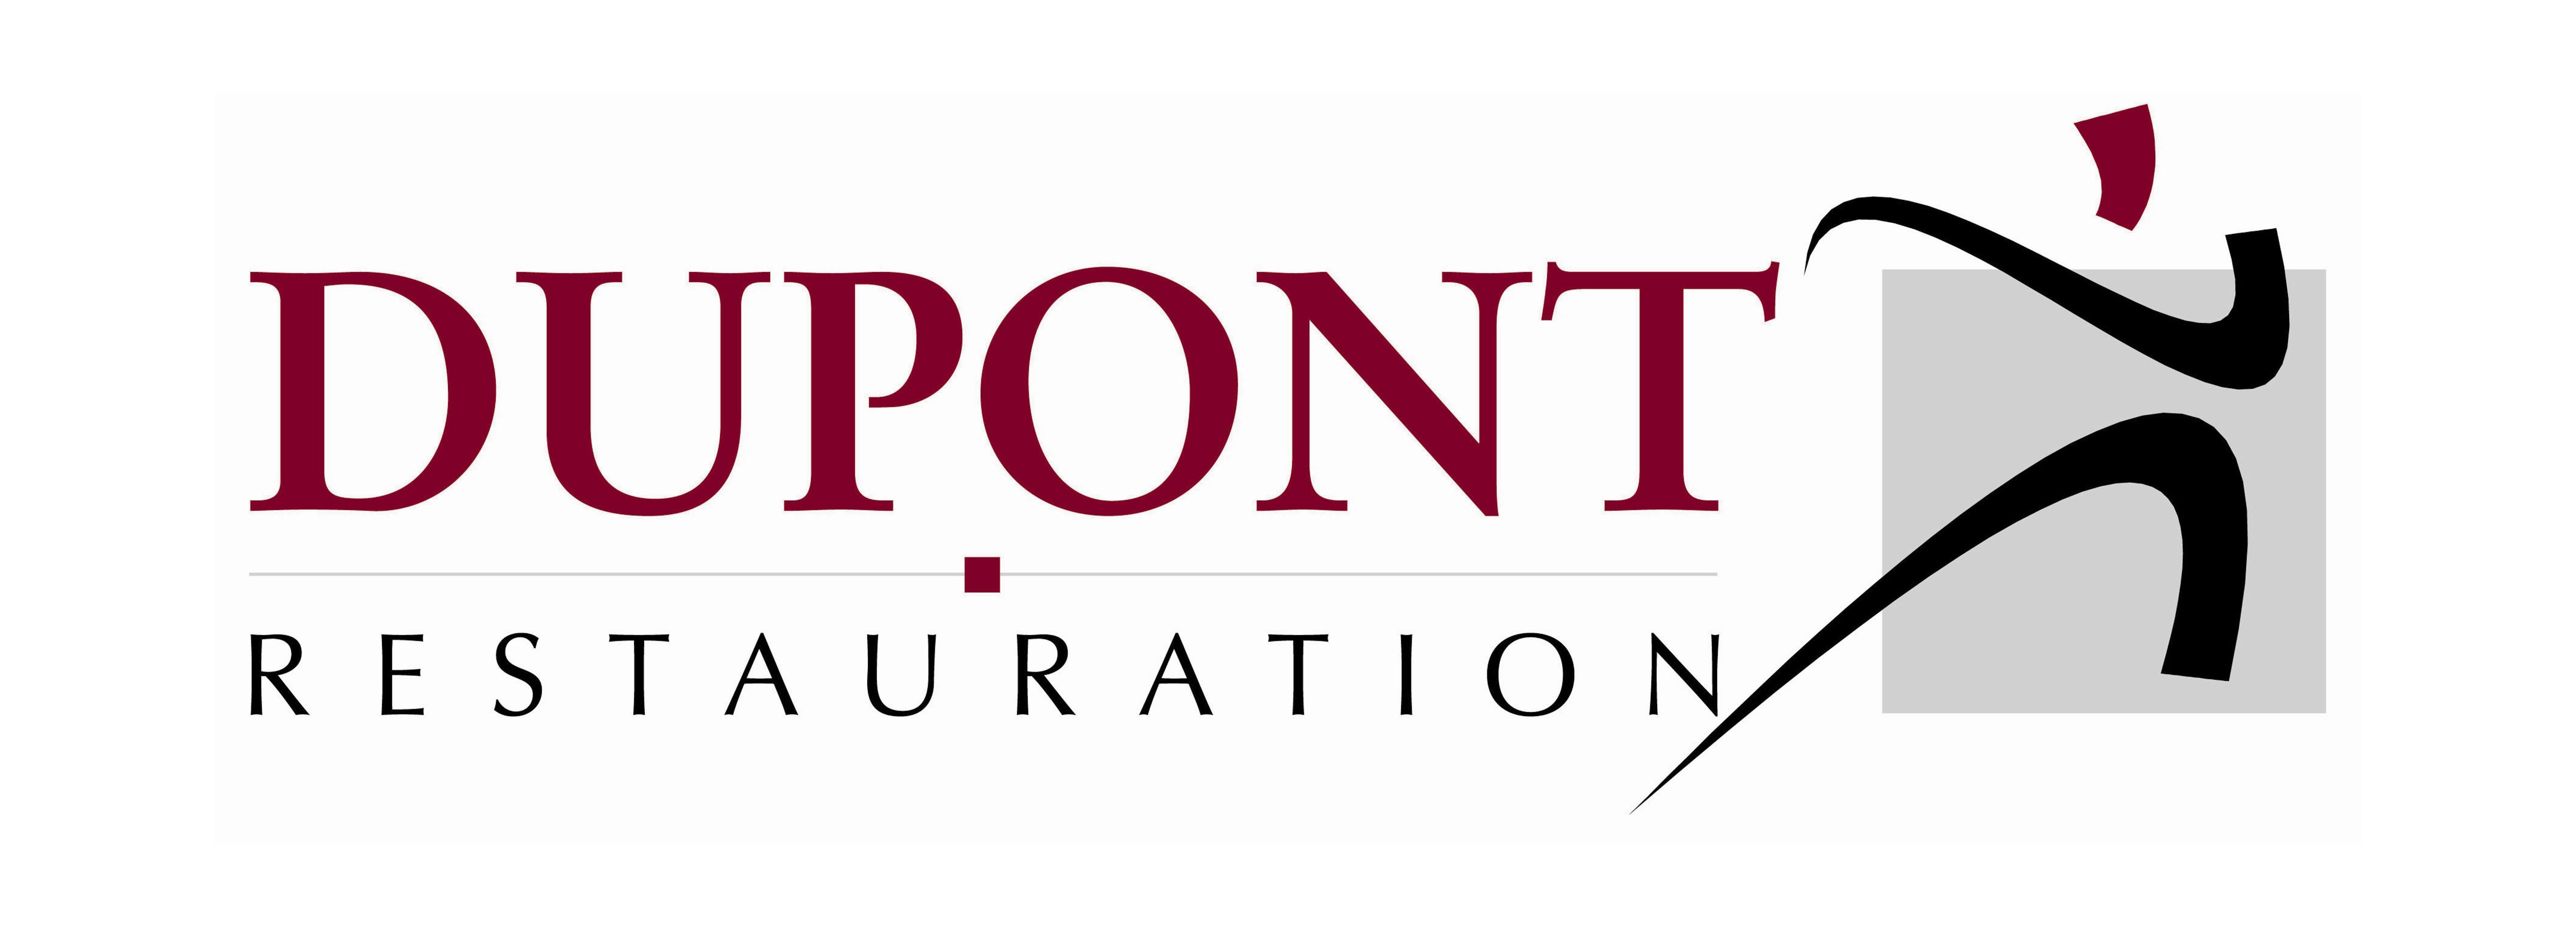 Dupont Restauration company logo